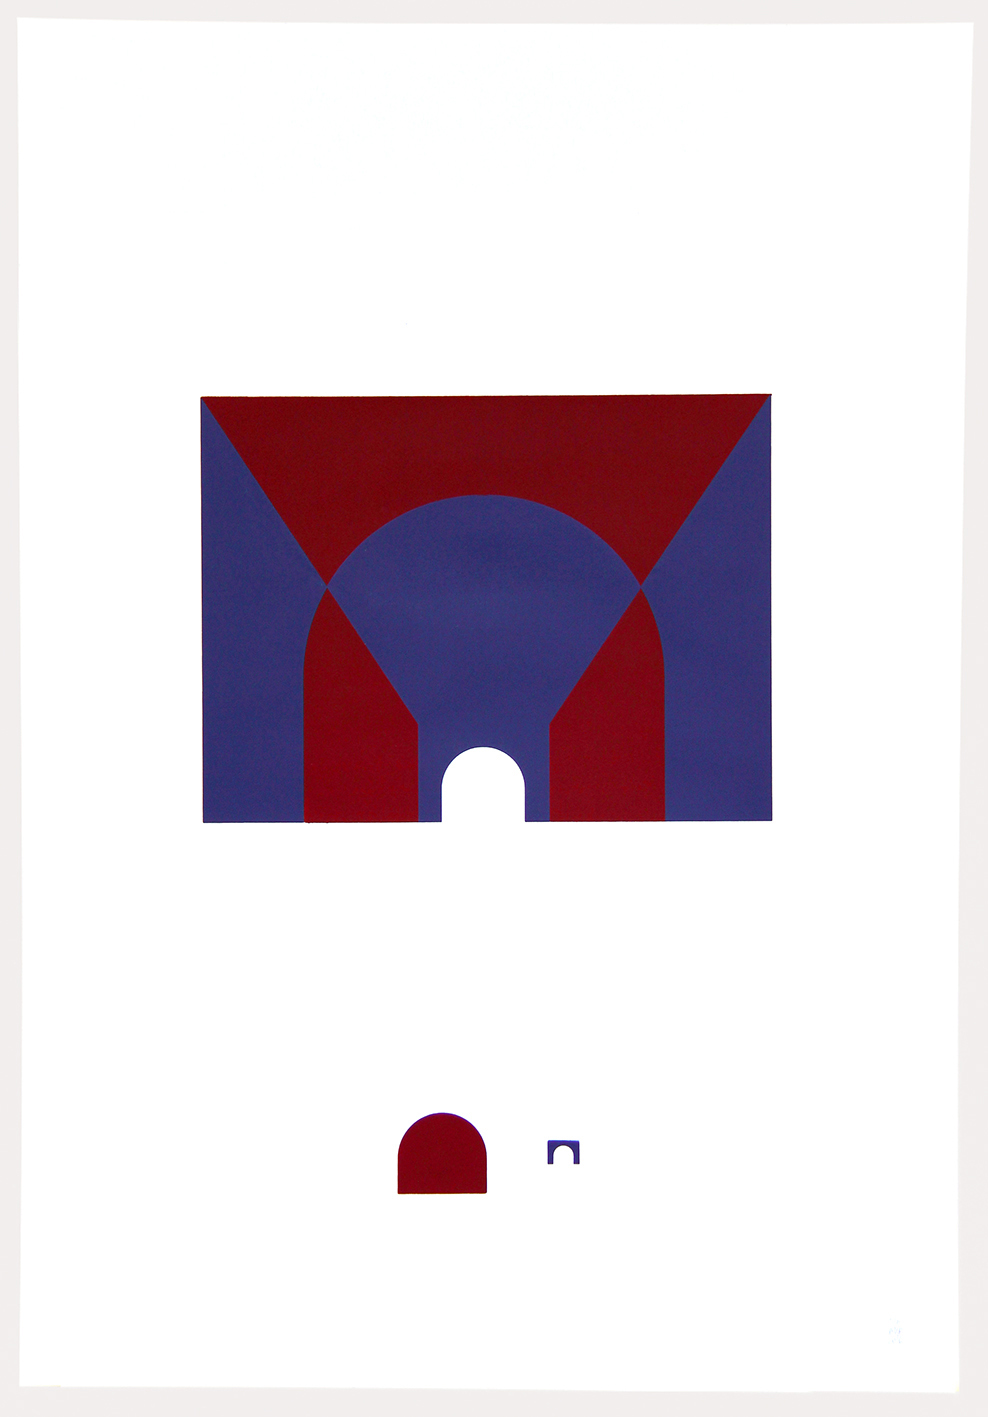 inout (Dialéctica)-2016 Serigrafia dos colores Dimensiones w:47cm h:67cm Serie de 6 $70.000.-